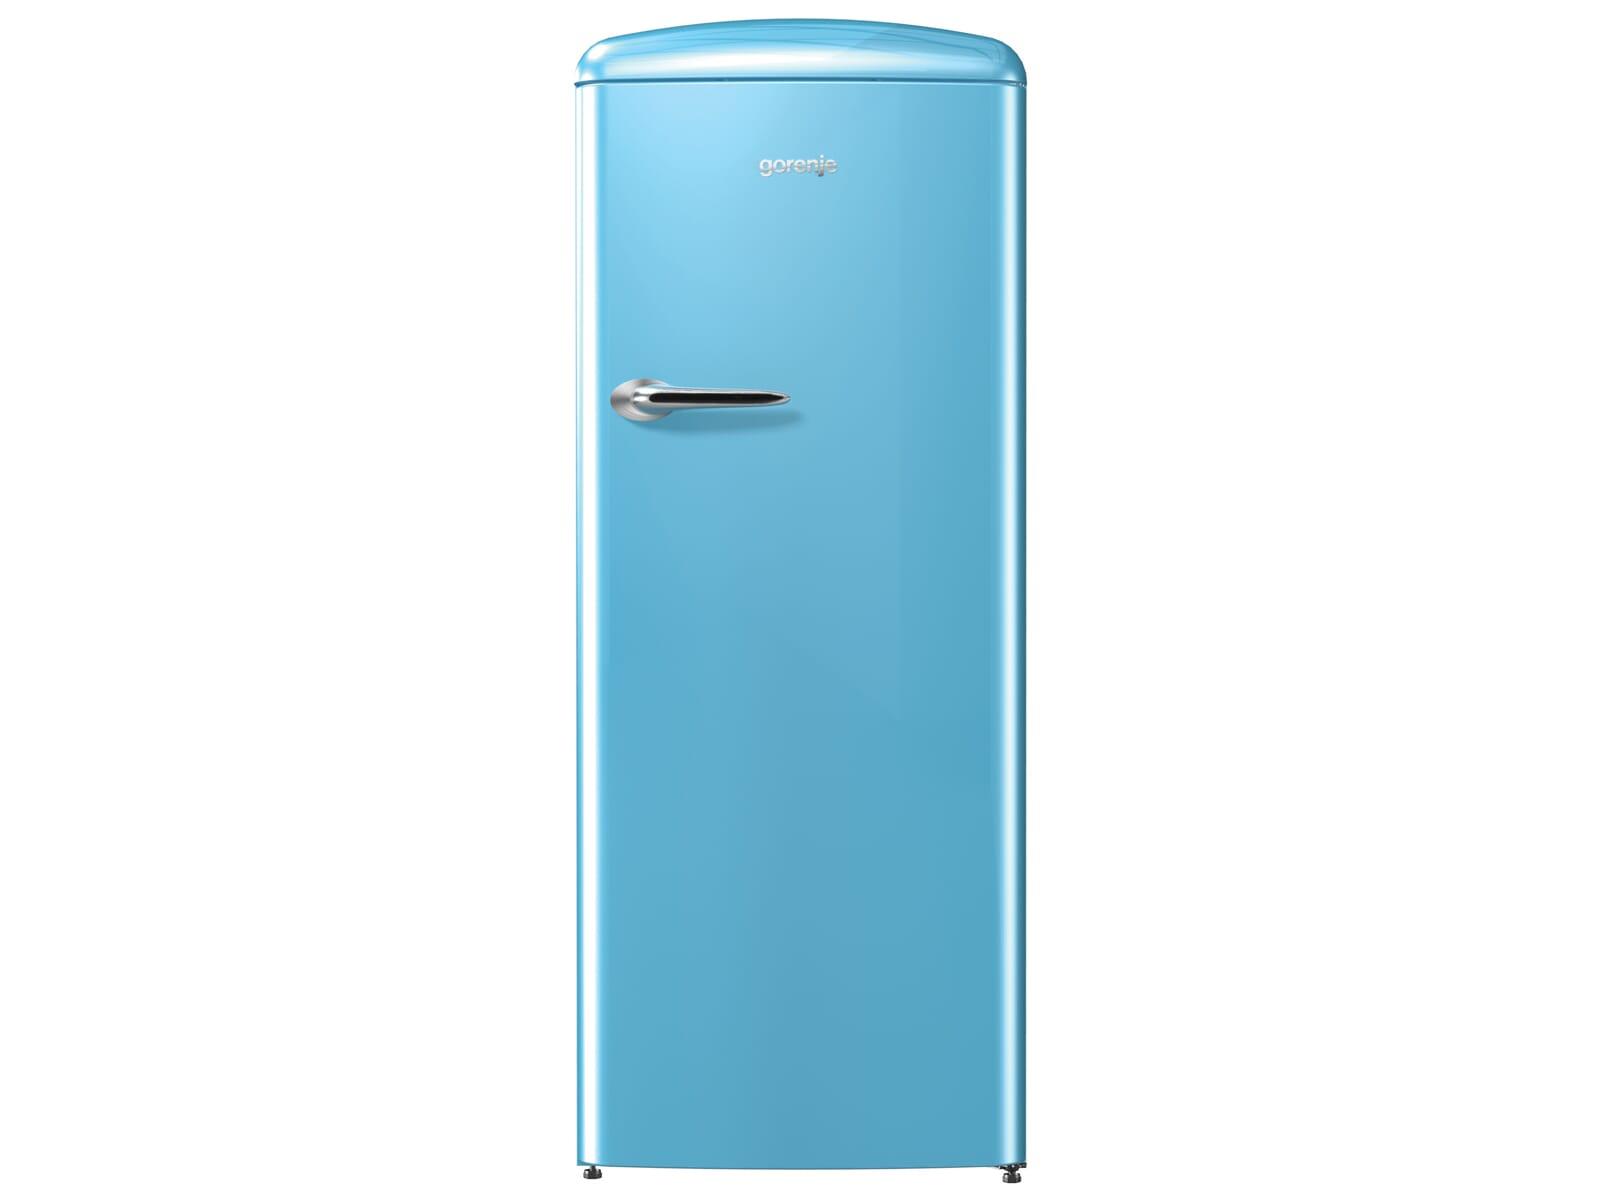 Gorenje Kühlschrank Mint : Gorenje retro kühlschrank mint design kühlschränke von gorenje